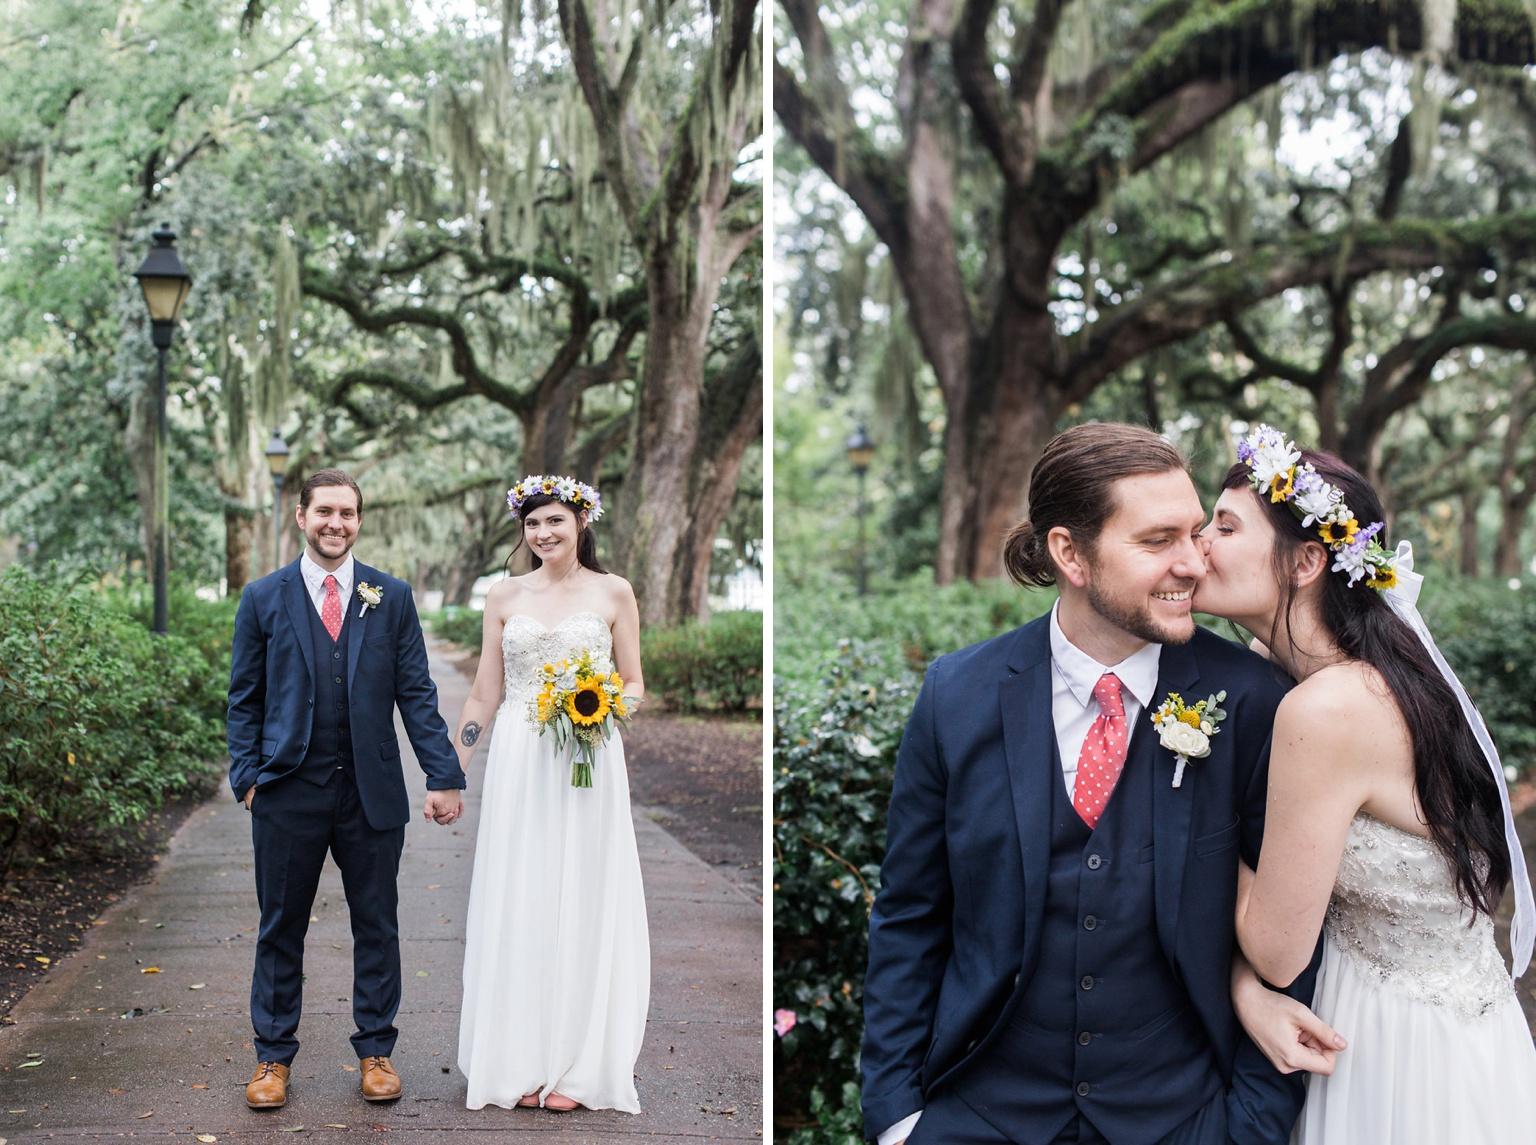 Apt_B_Photo_Savannah_Wedding_Photographer_Flower_Crown049.JPG